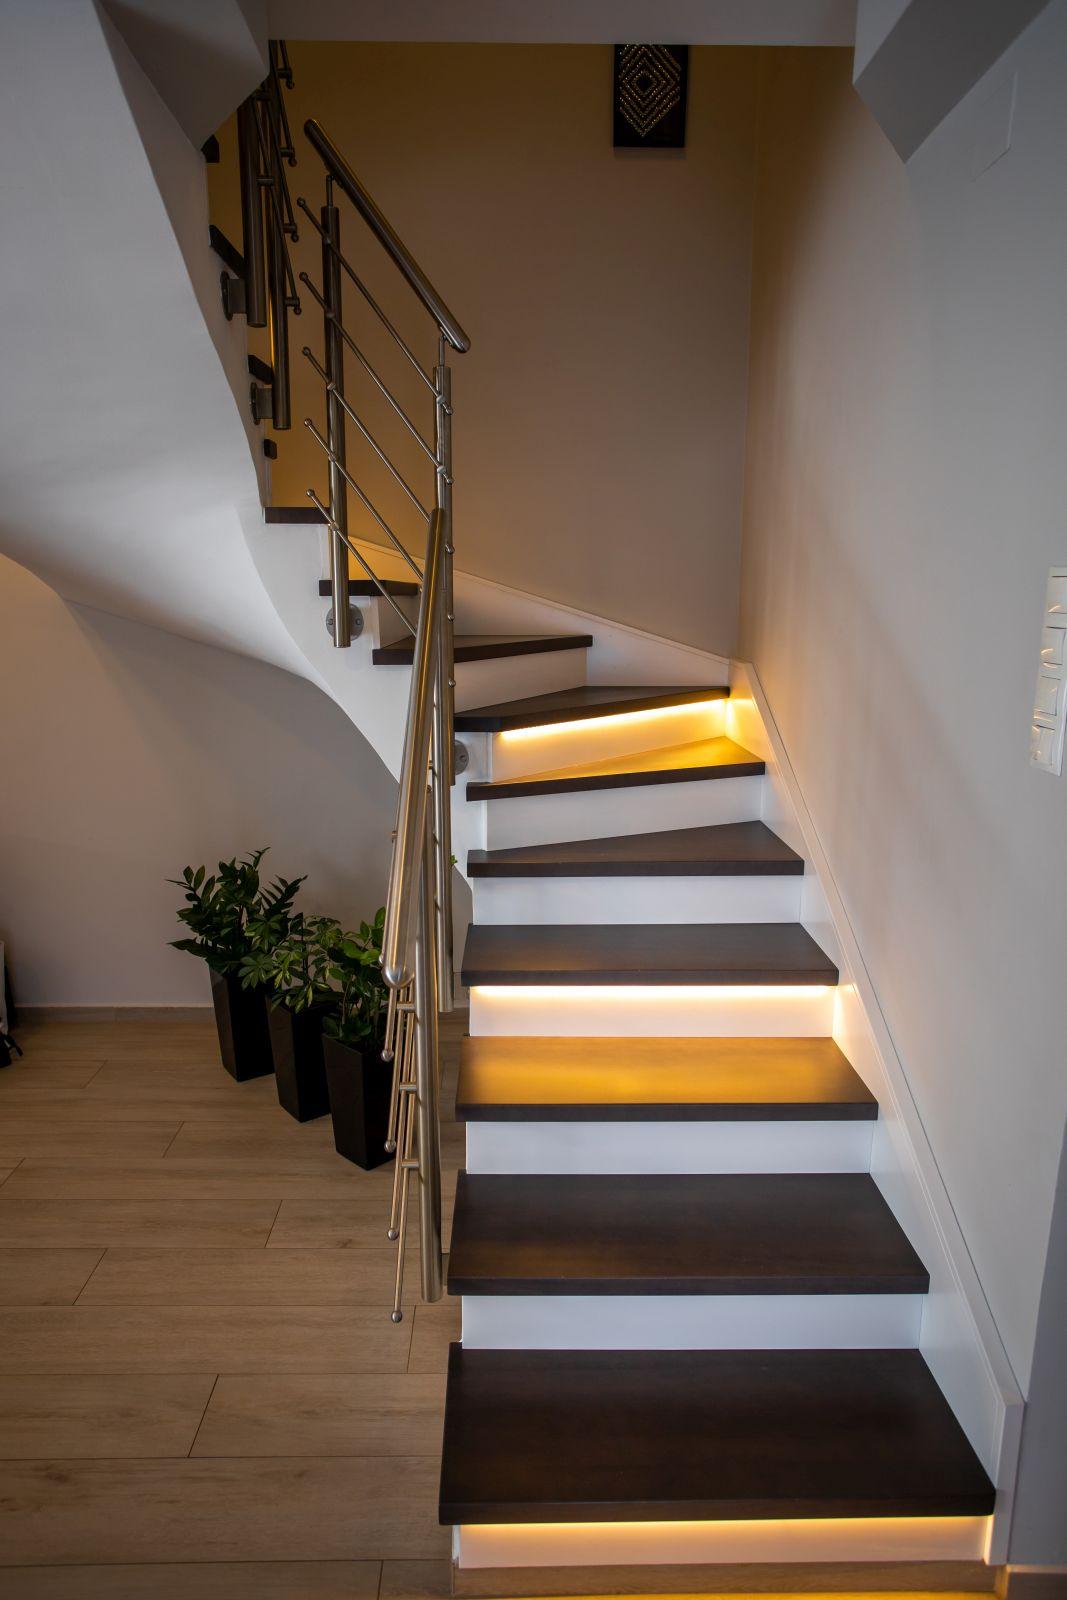 Bükkfa lépcsőfokok, fújt MDF lépcsőkísérővel